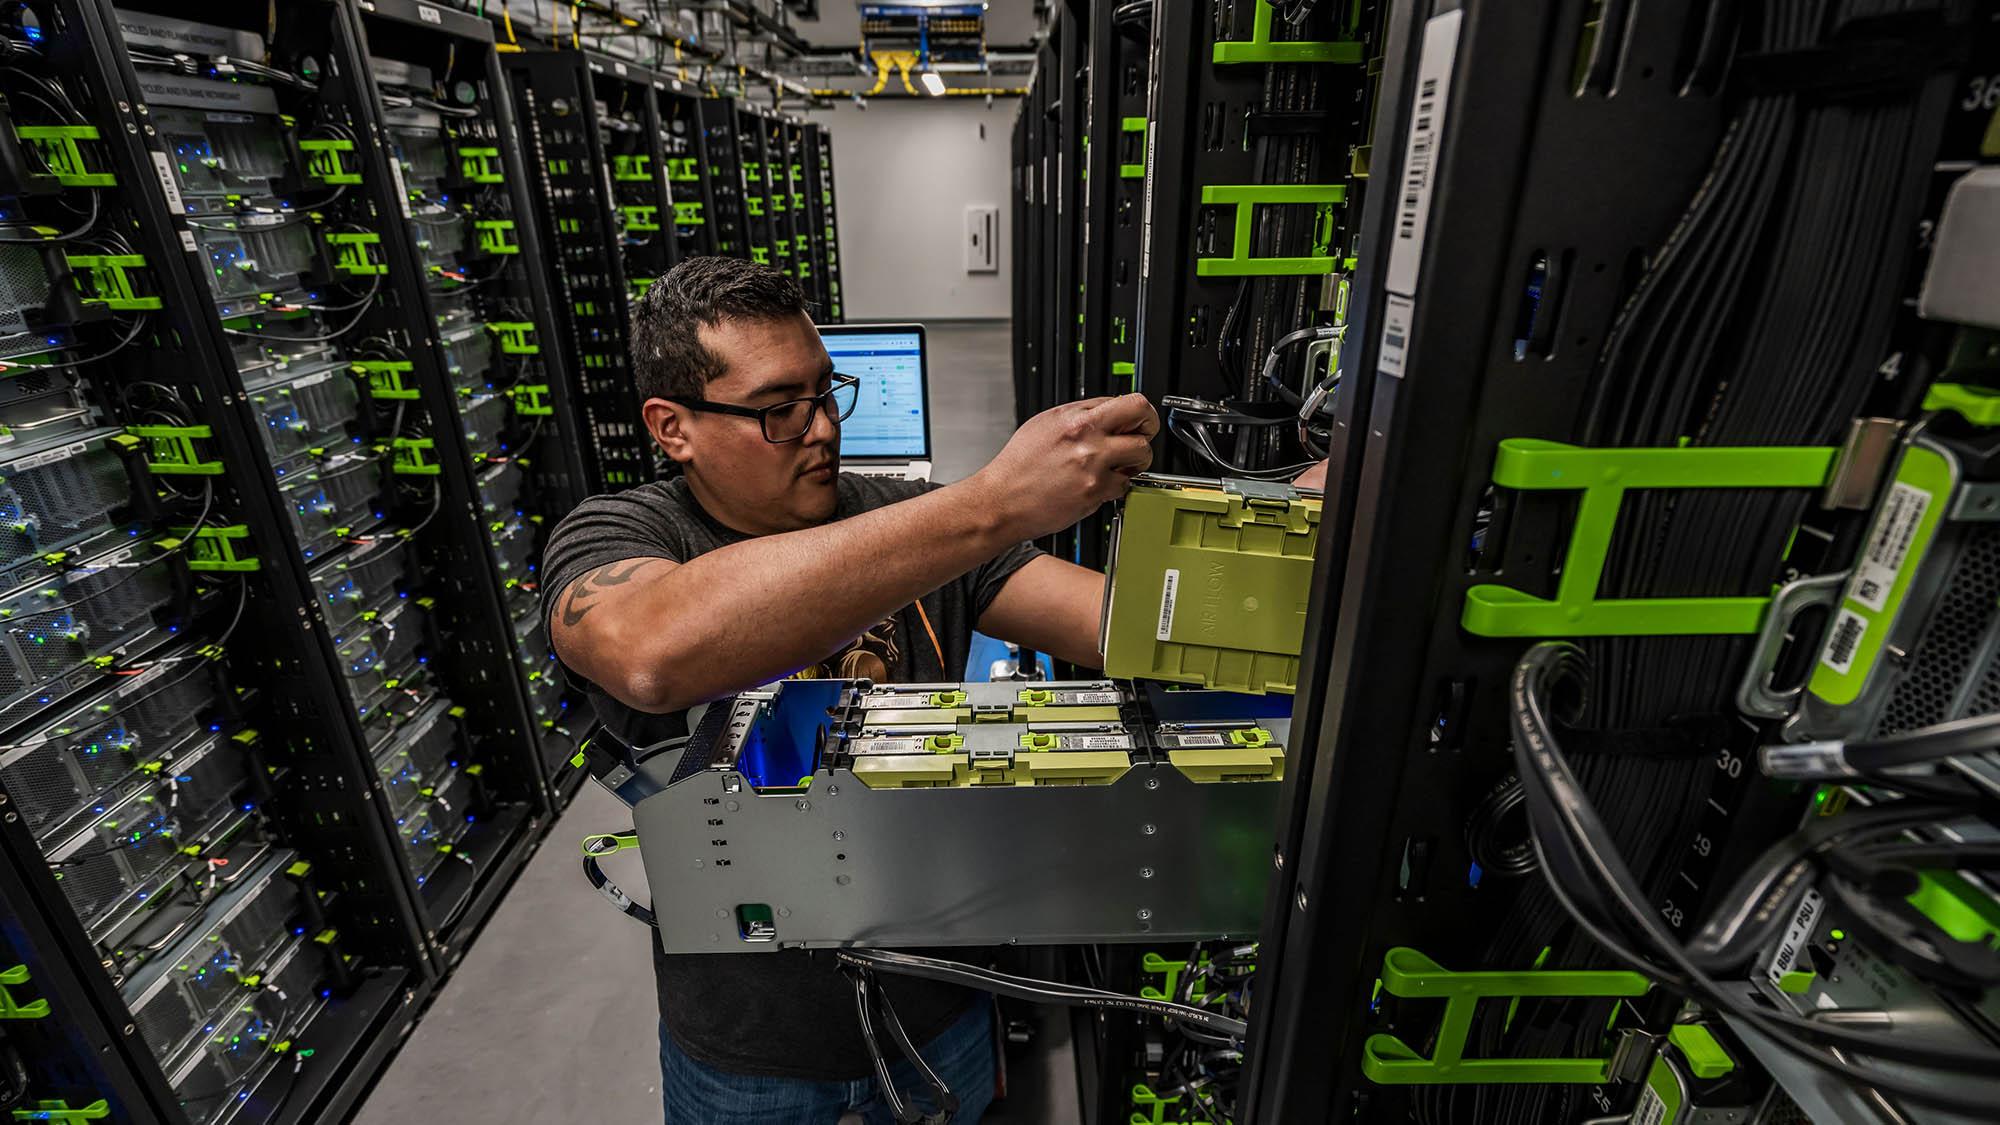 Facebook announces next-generation Open Rack frame